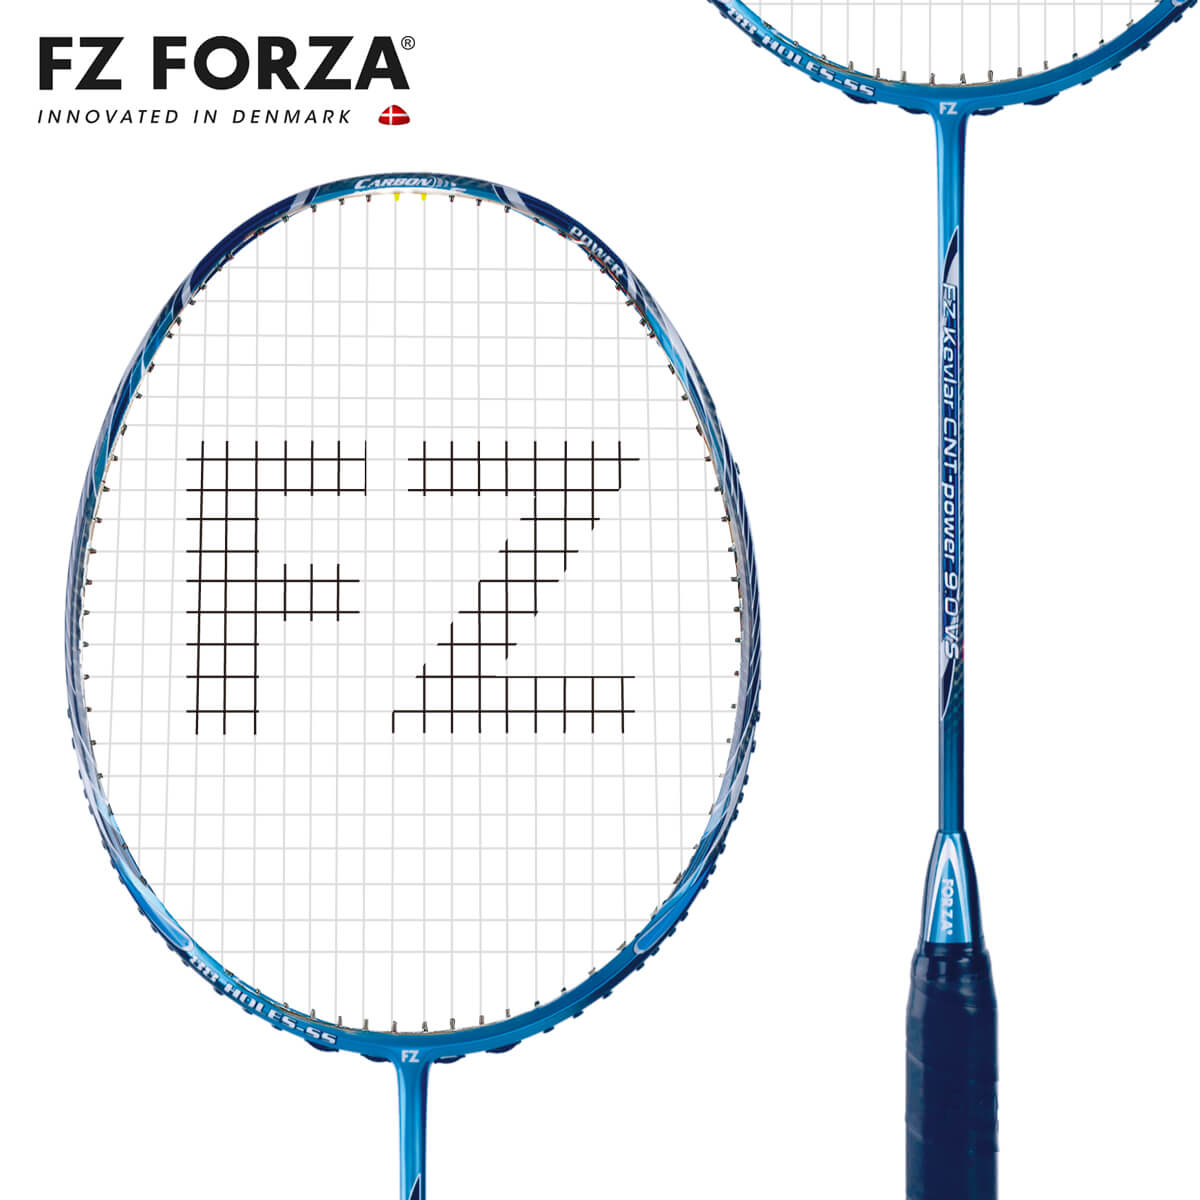 FZ FORZA Kevlar CNT-power 9.0VS 88ホール FZ フォーザ バドミントンラケット【オススメガット&ガット張り工賃無料】